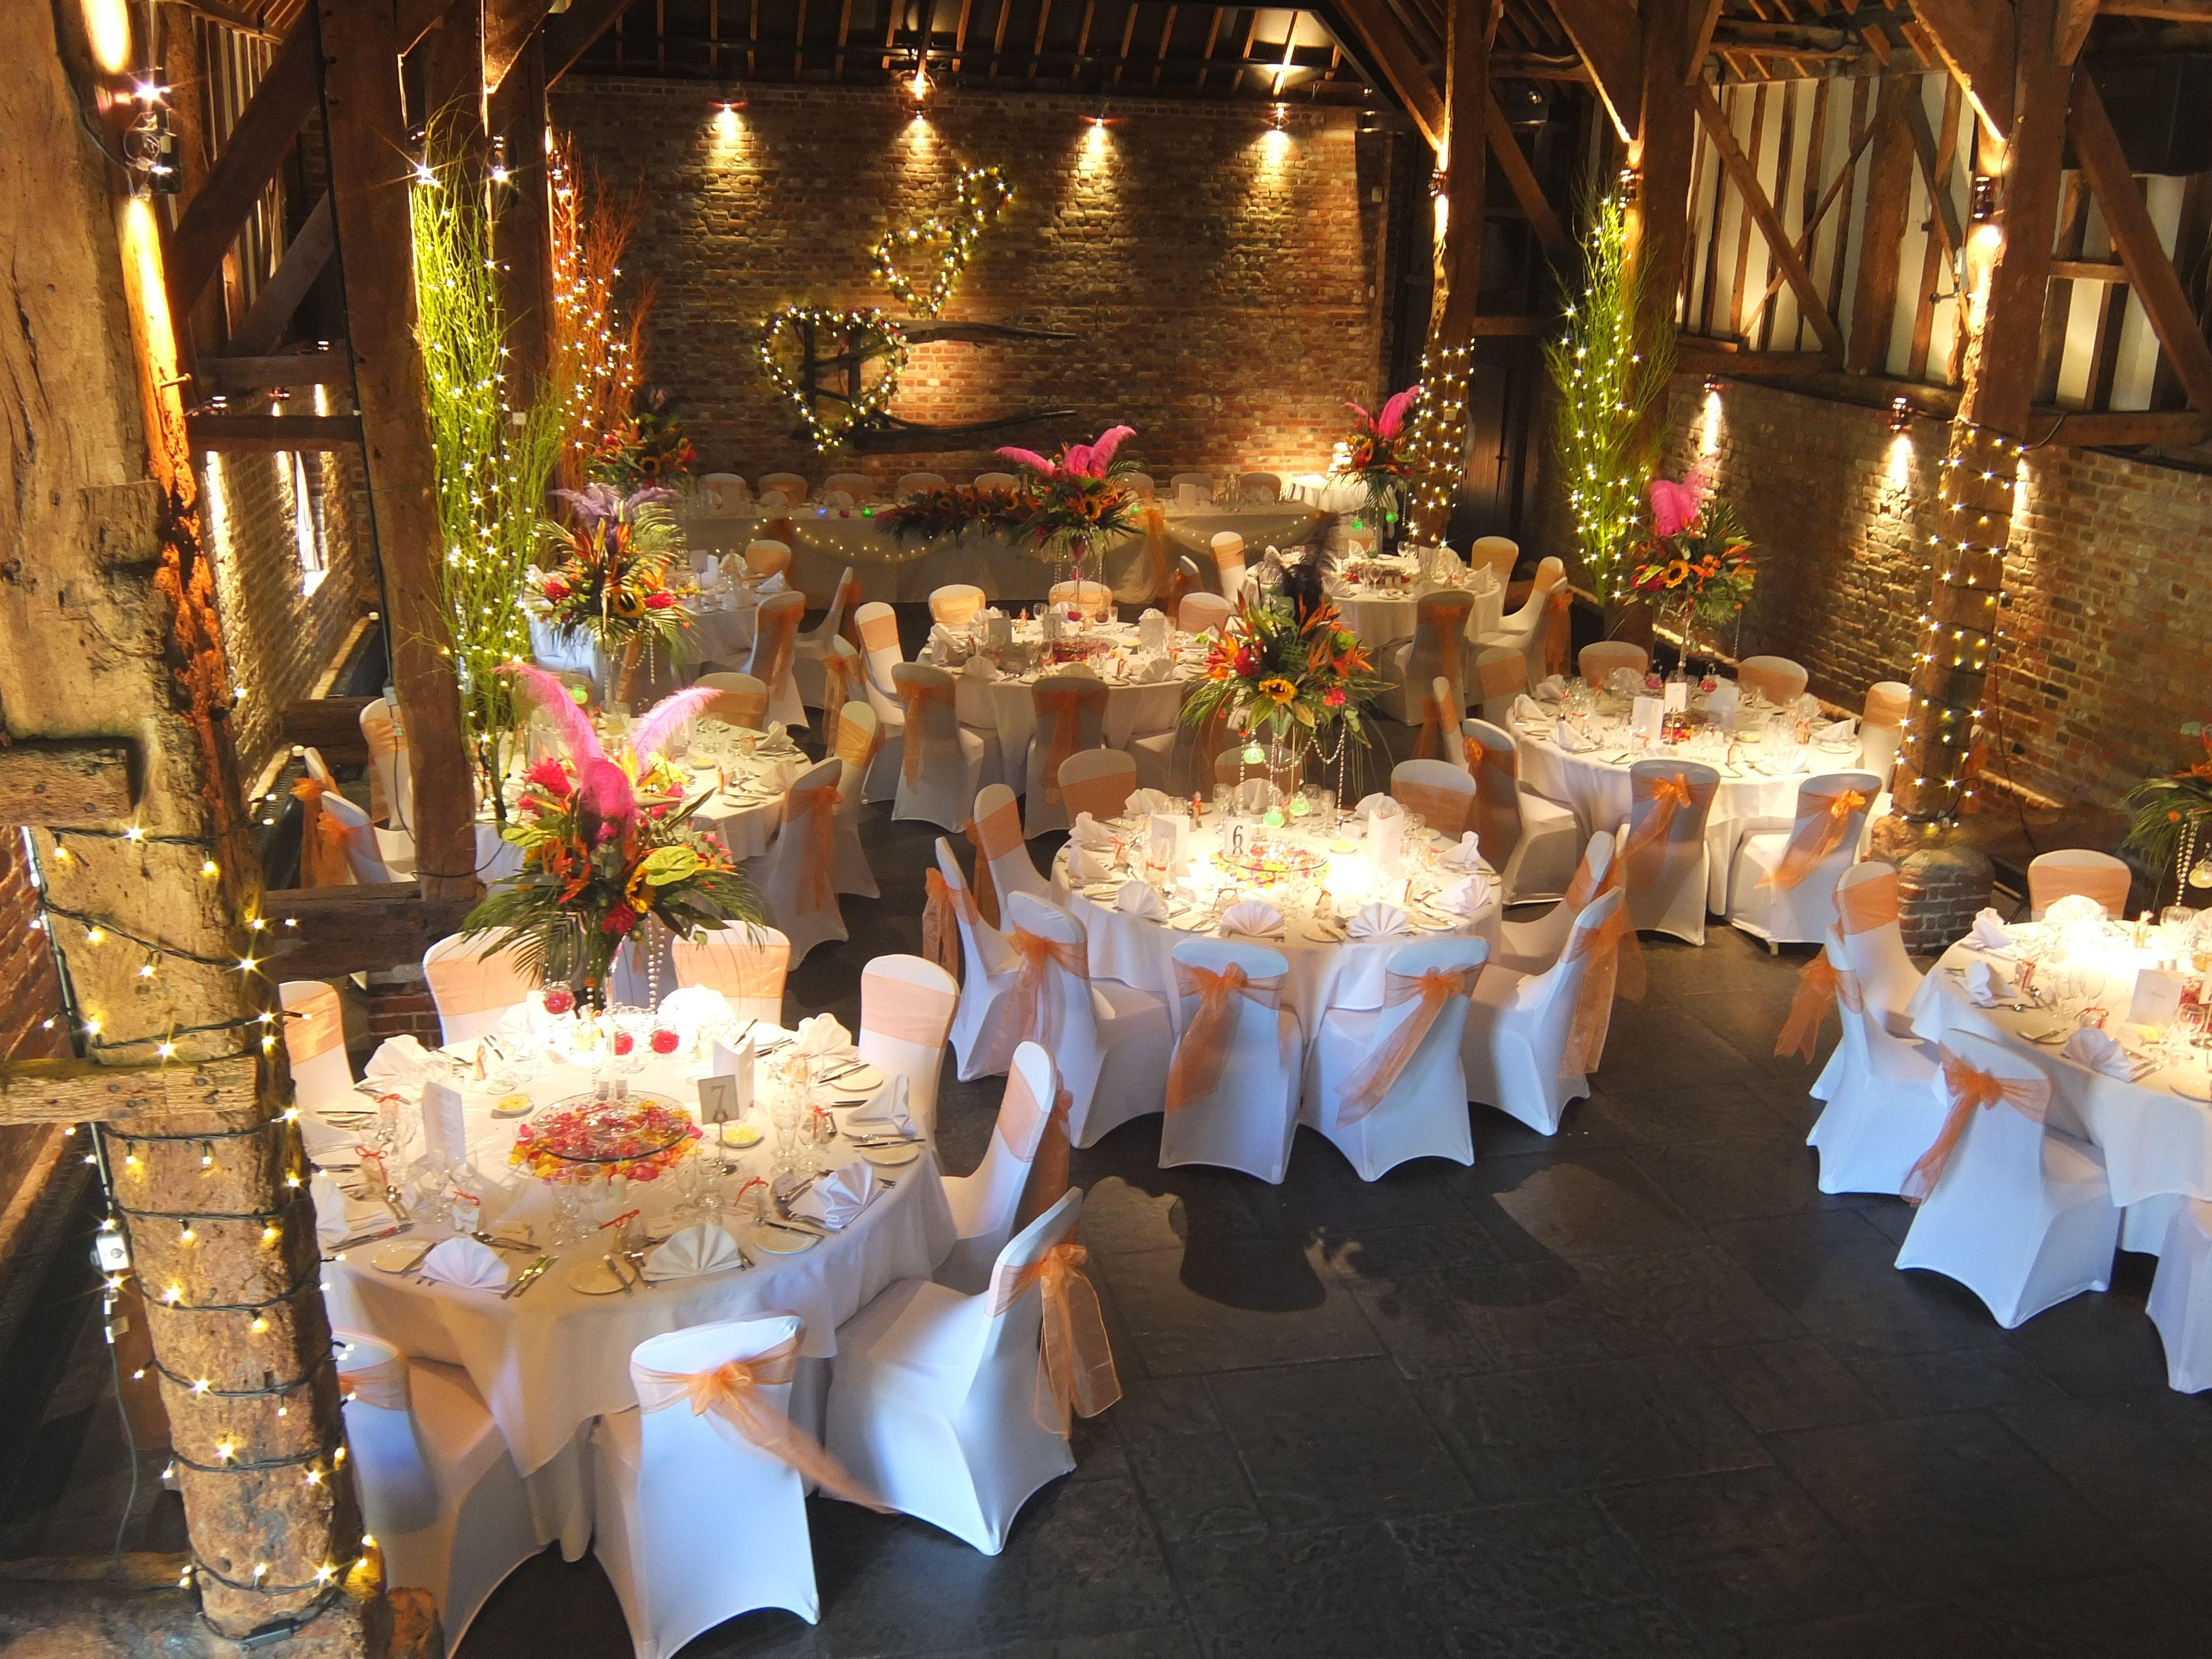 barn wedding venue london%0A The Tithe Barn  Wedding Venue in Kent    A girl can dream   Pinterest   Barn  weddings  Wedding venues and Barn